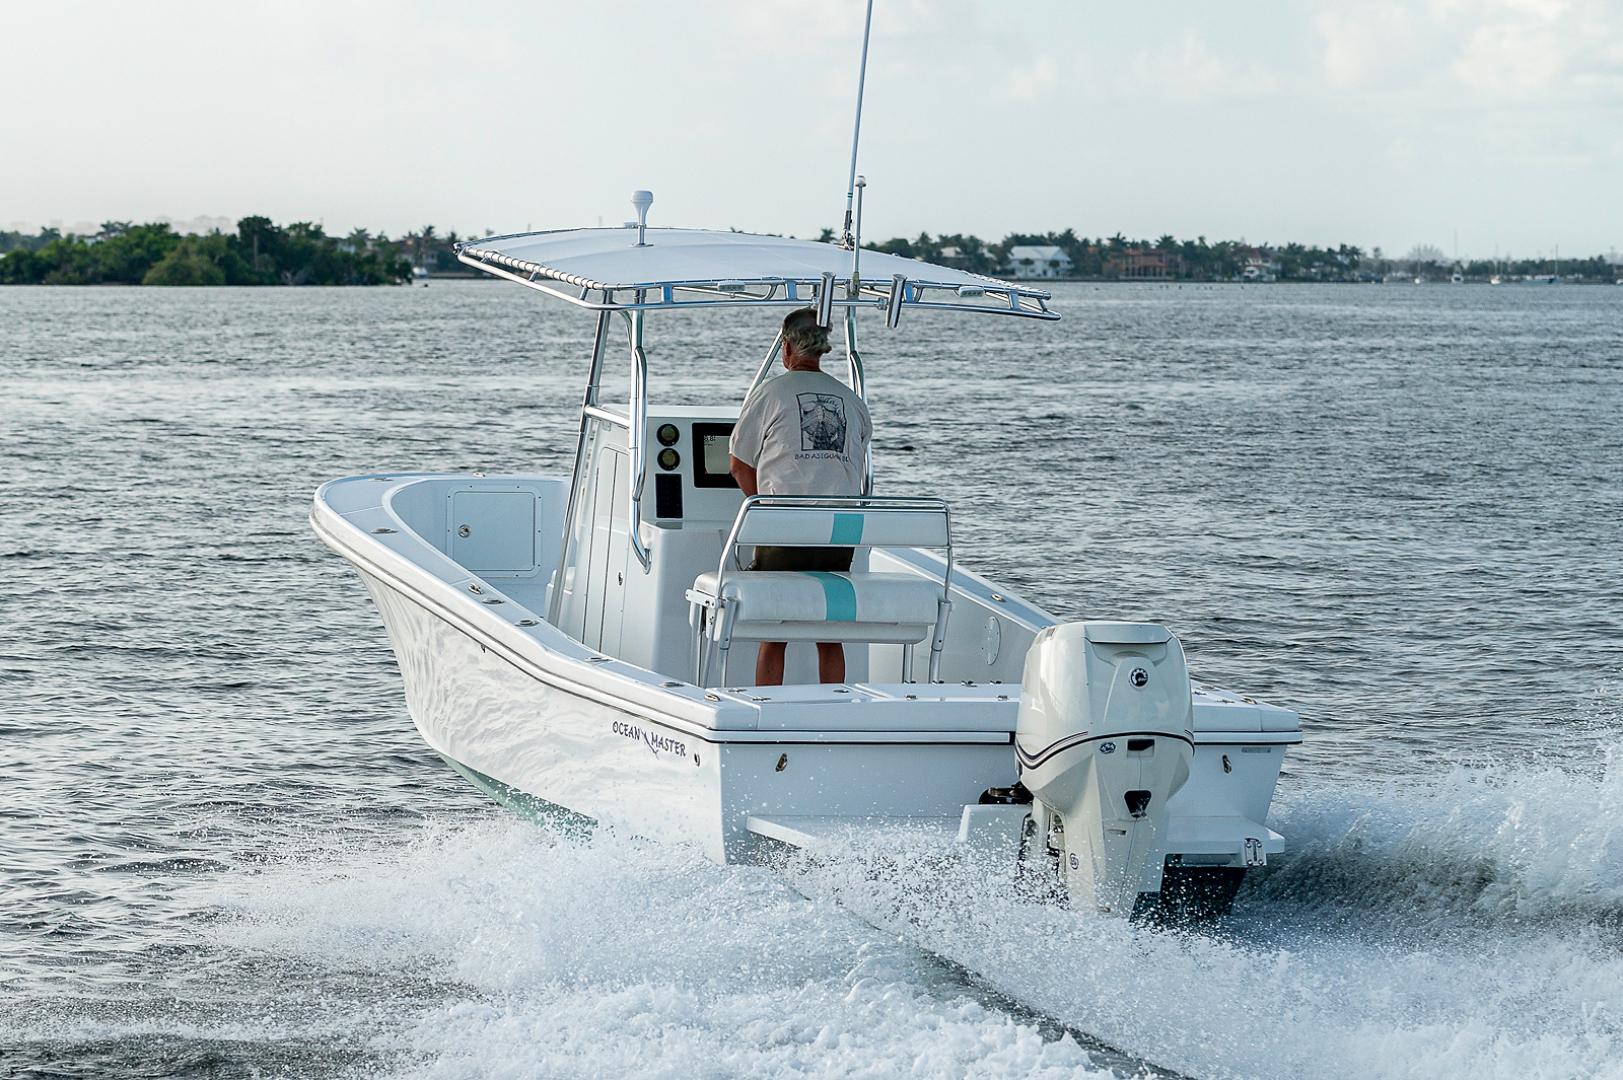 Ocean Master 2013-27 Ocean Master Palm Beach-Florida-United States-27 Ocean Master-1501383 | Thumbnail